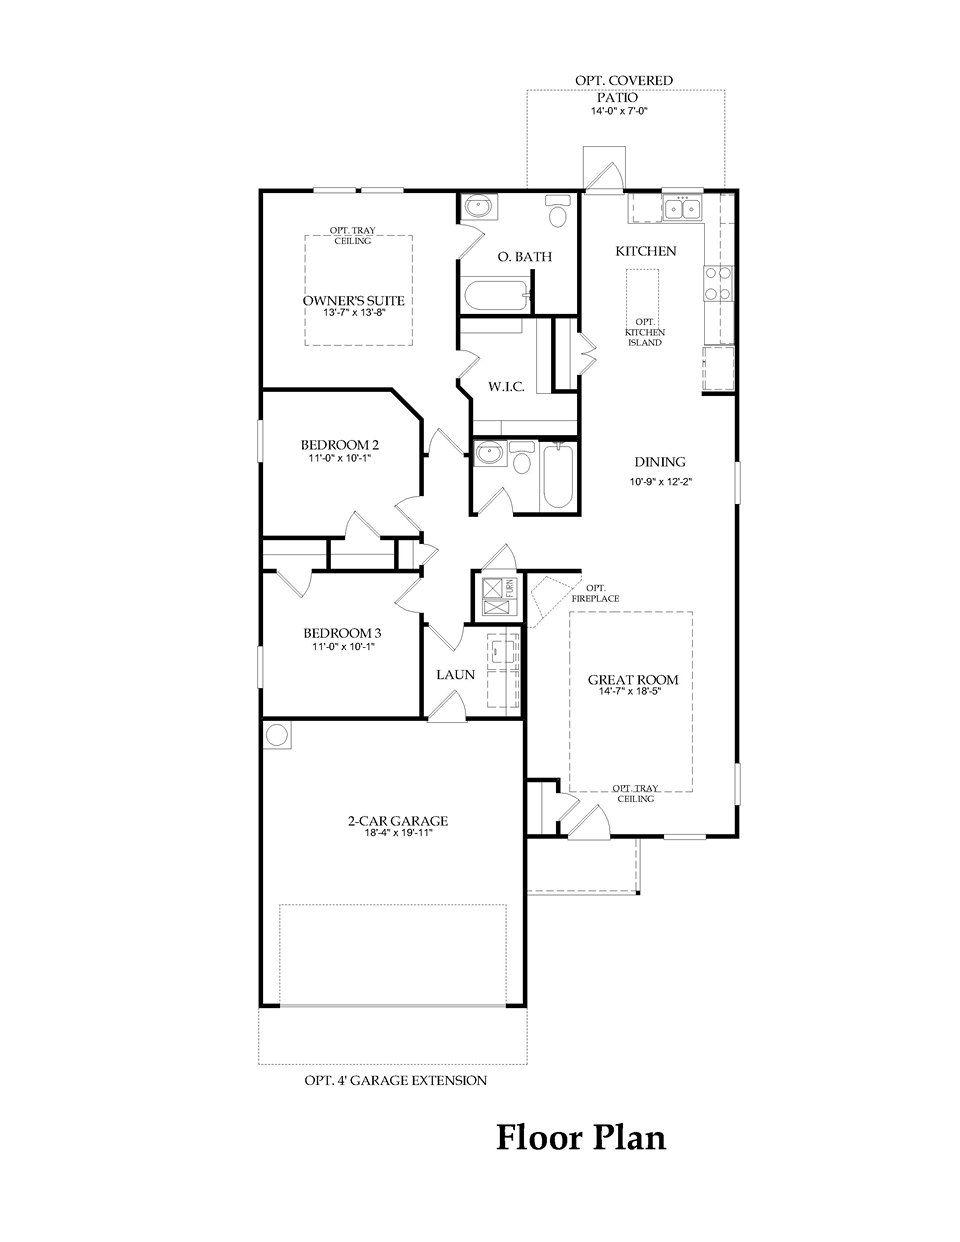 pulte home becket model 1447 sq ft floor plans regular